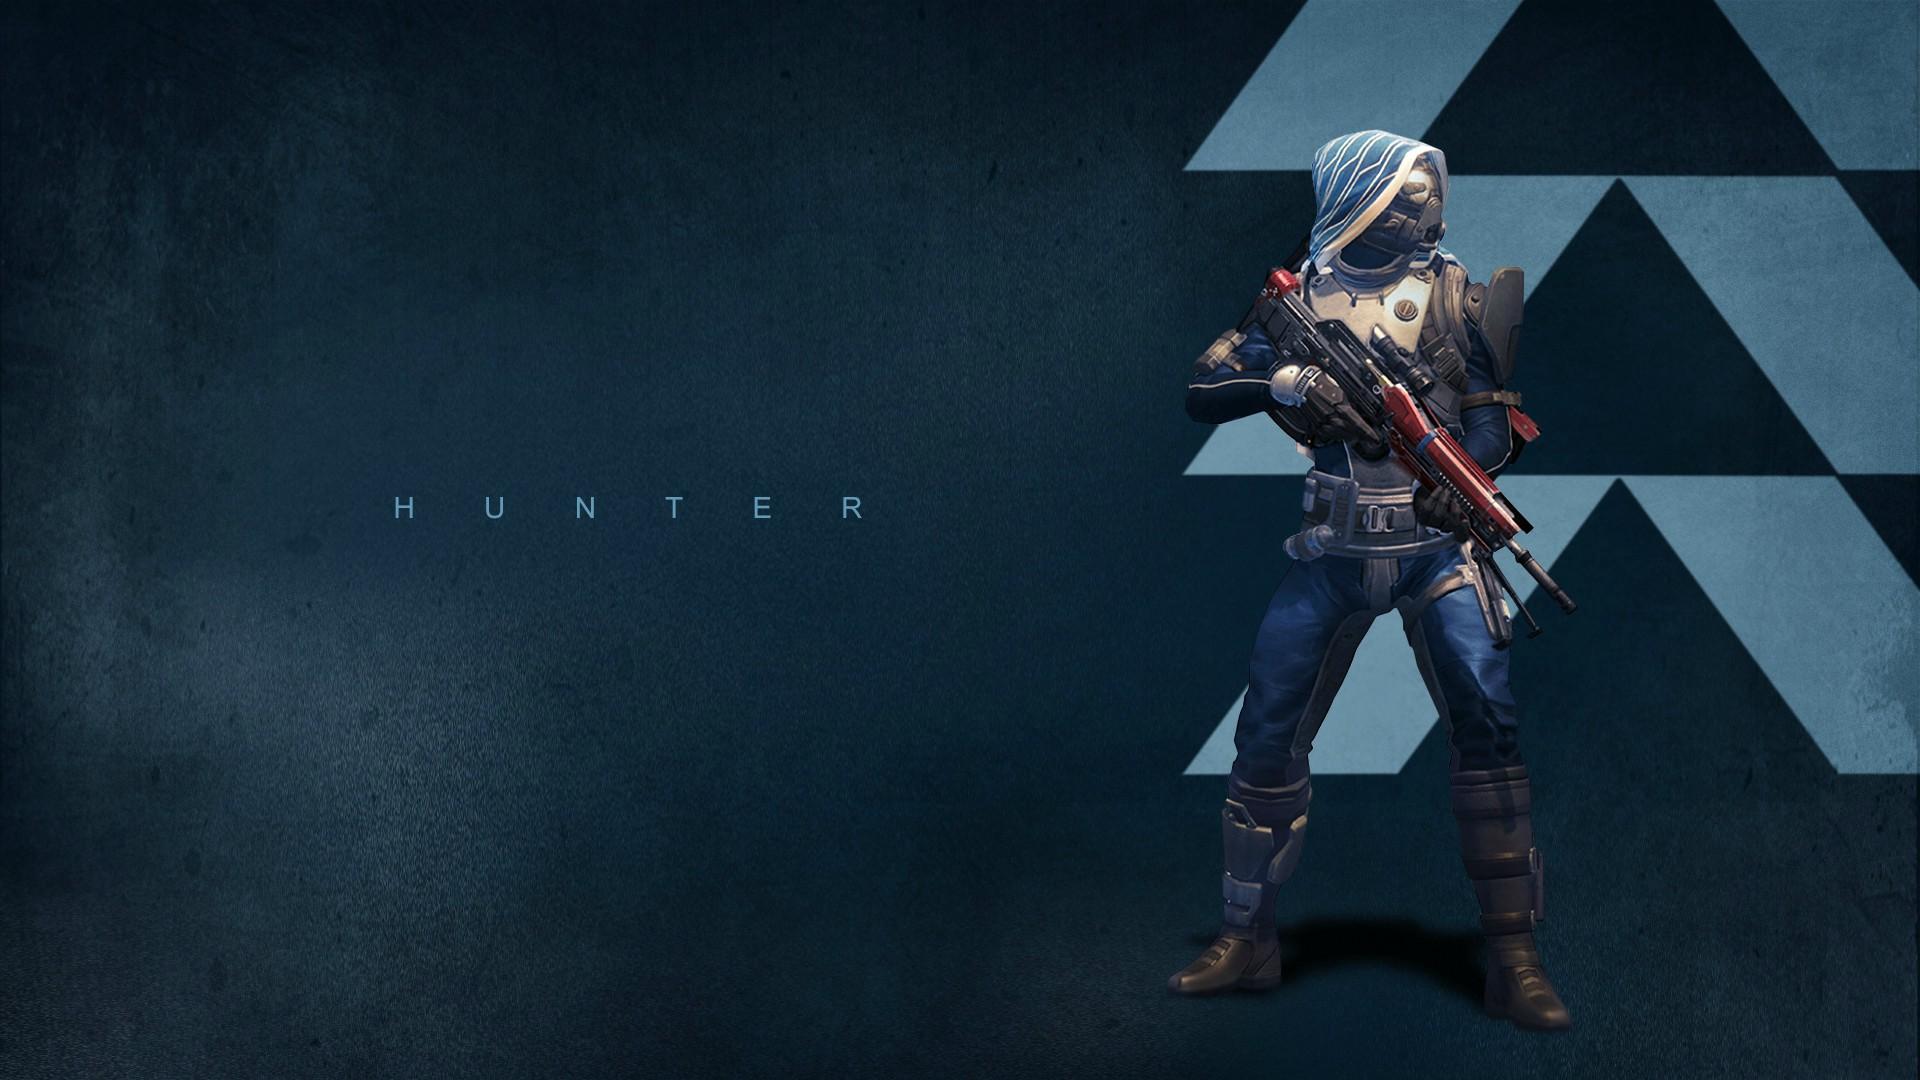 destiny video games wallpaper - photo #22